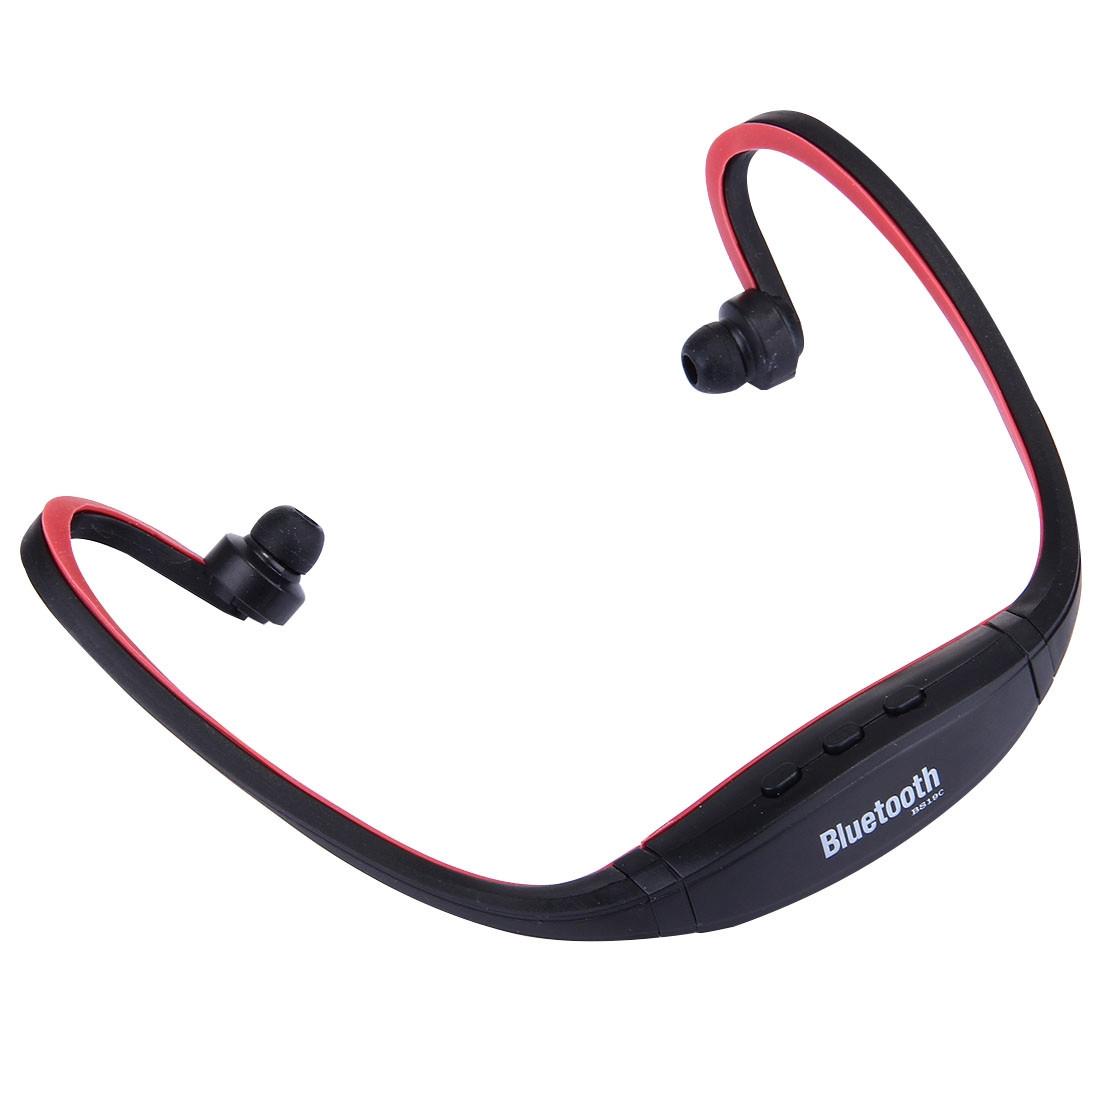 Cuffie auricolari sport bluetooth headphones ricevitore radio fm mp3 player microsd vivavoce - Cuffie per sport ...